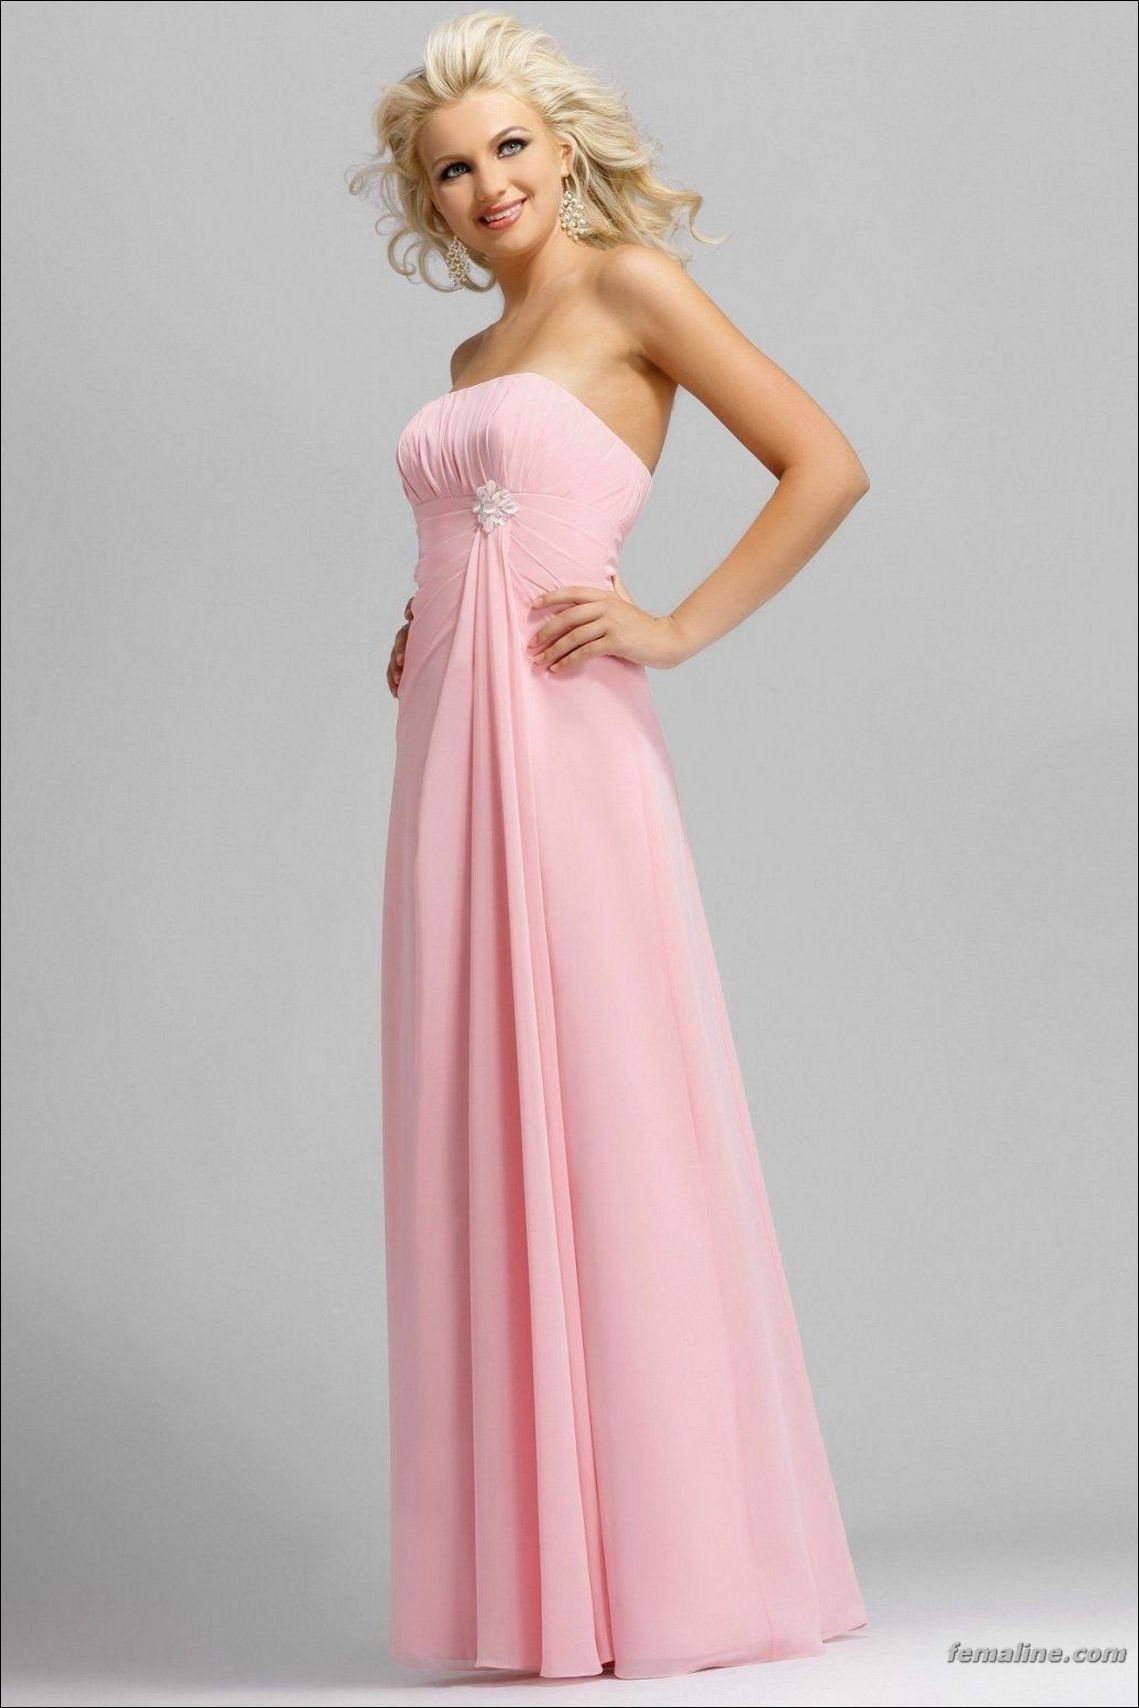 100 Latest Trends Bridesmaid Dresses | Wedding dress, Wedding and ...